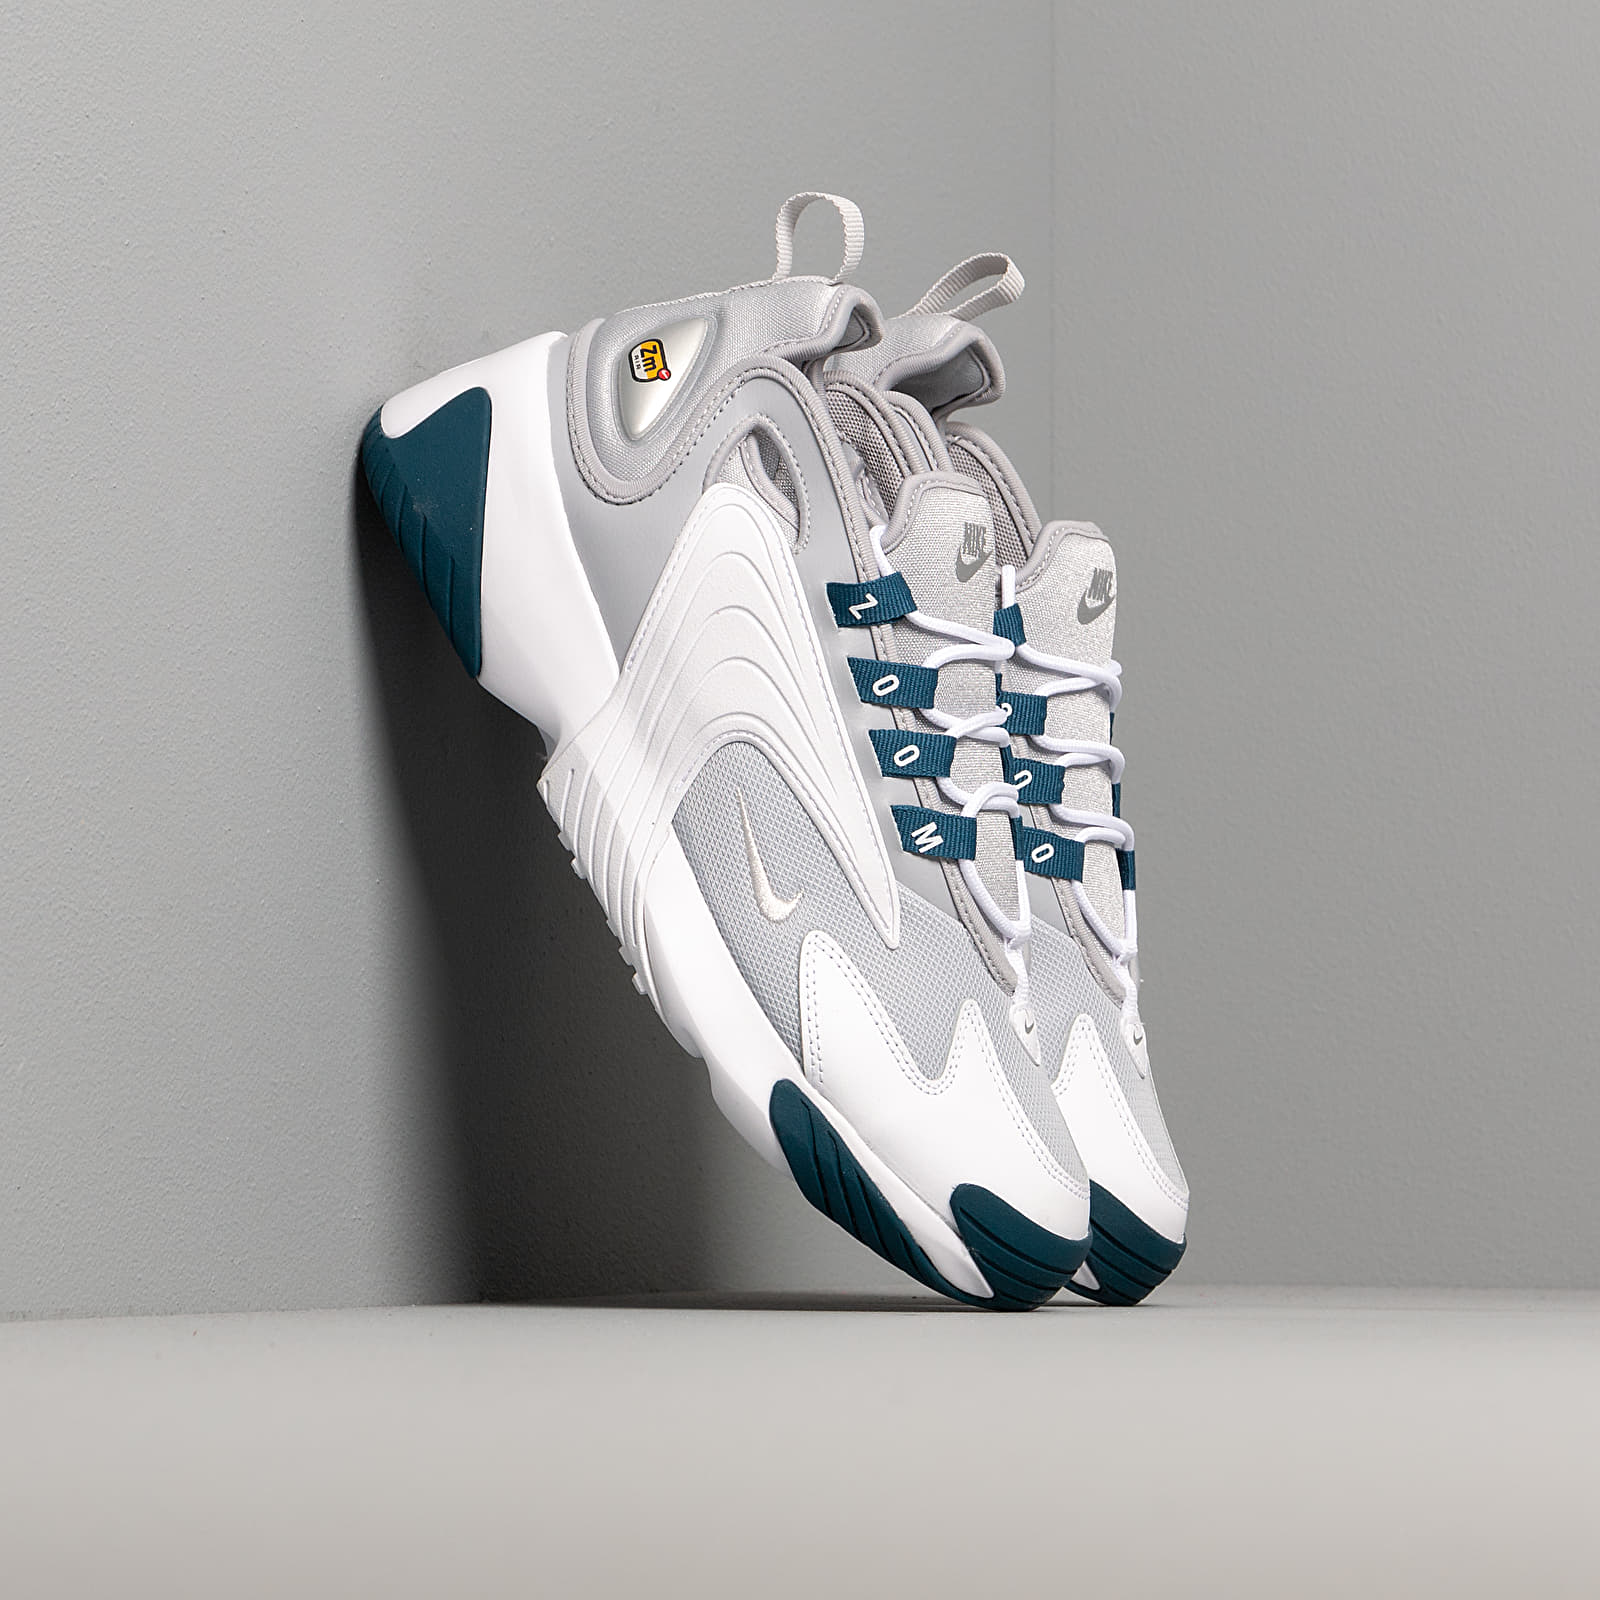 Dámské tenisky a boty Nike Wmns Zoom 2K Wolf Grey/ Mtlc Platinum-Blue Force-White